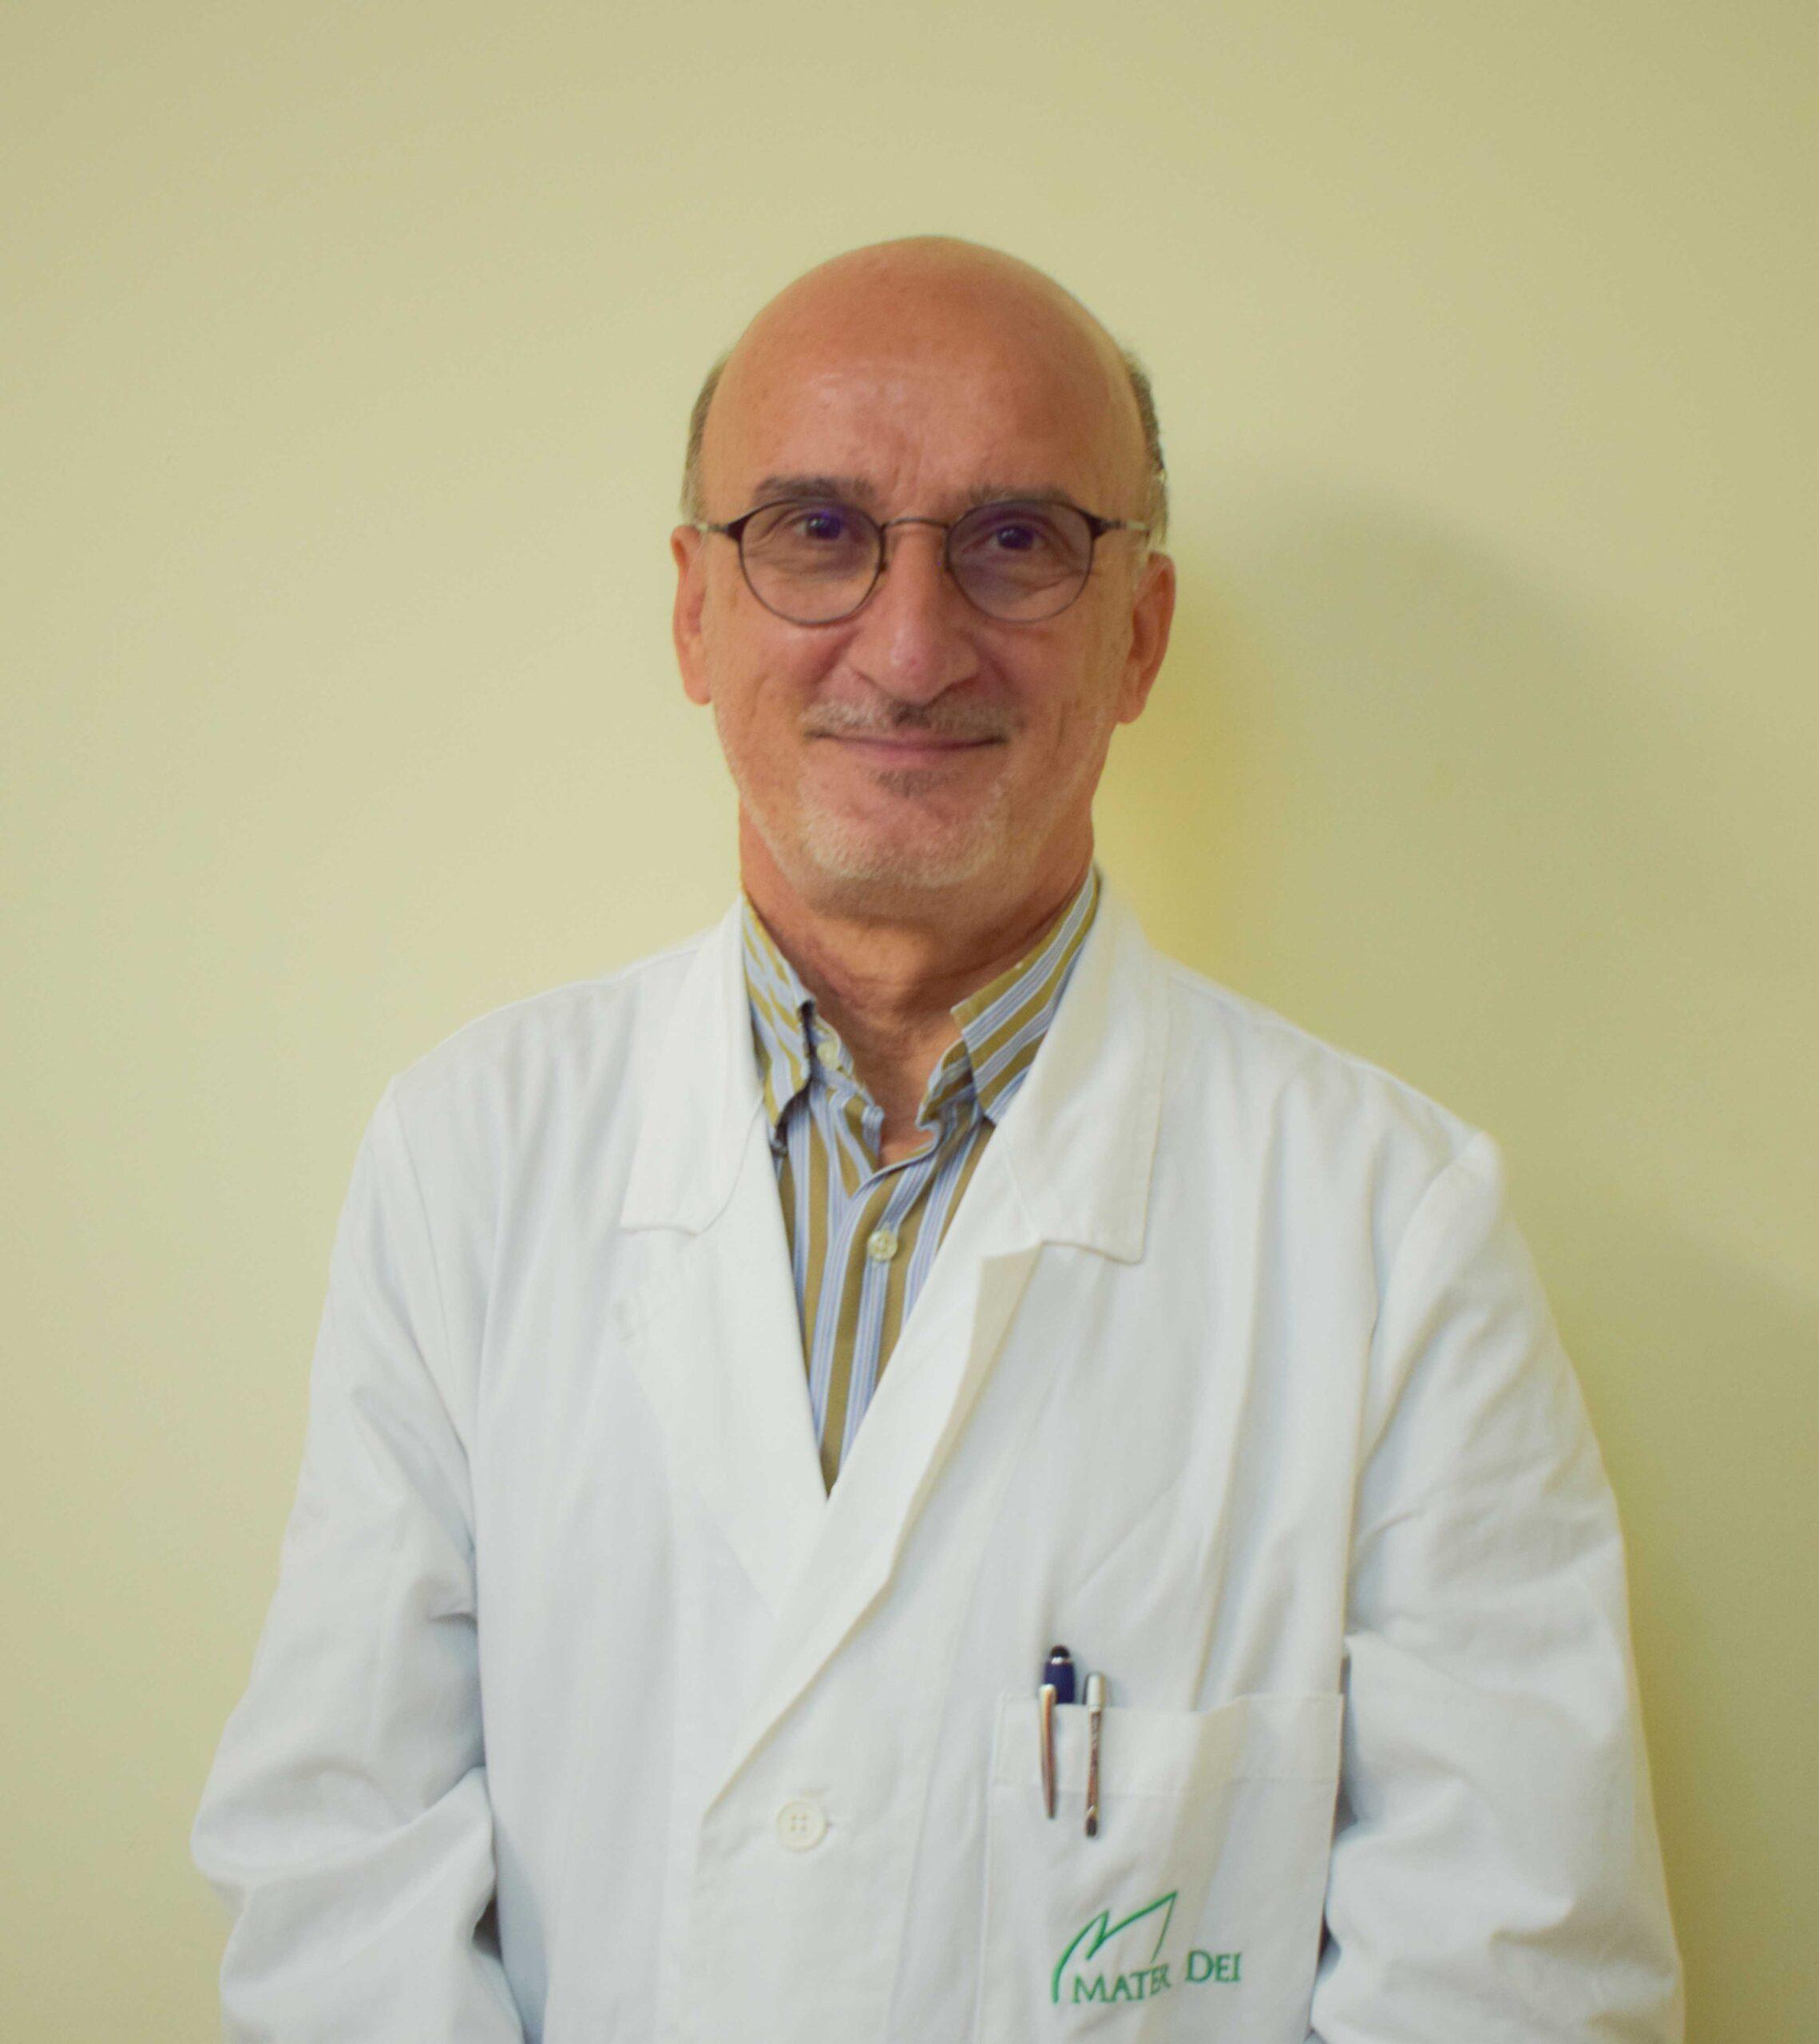 Dott. Sebastiano Tirrò